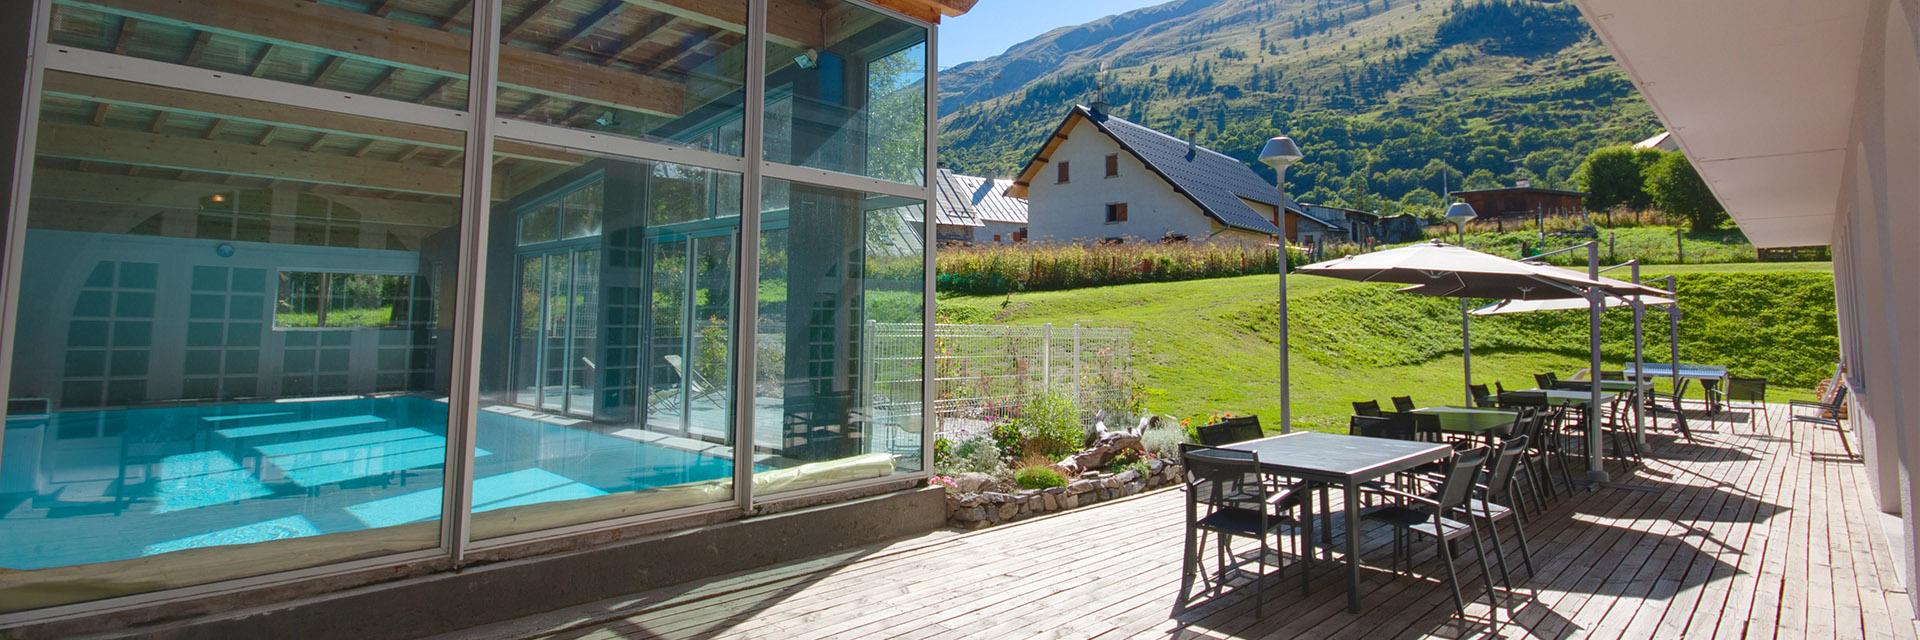 Village_club_vacances_savoi-vanoise-la-pulka-piscine